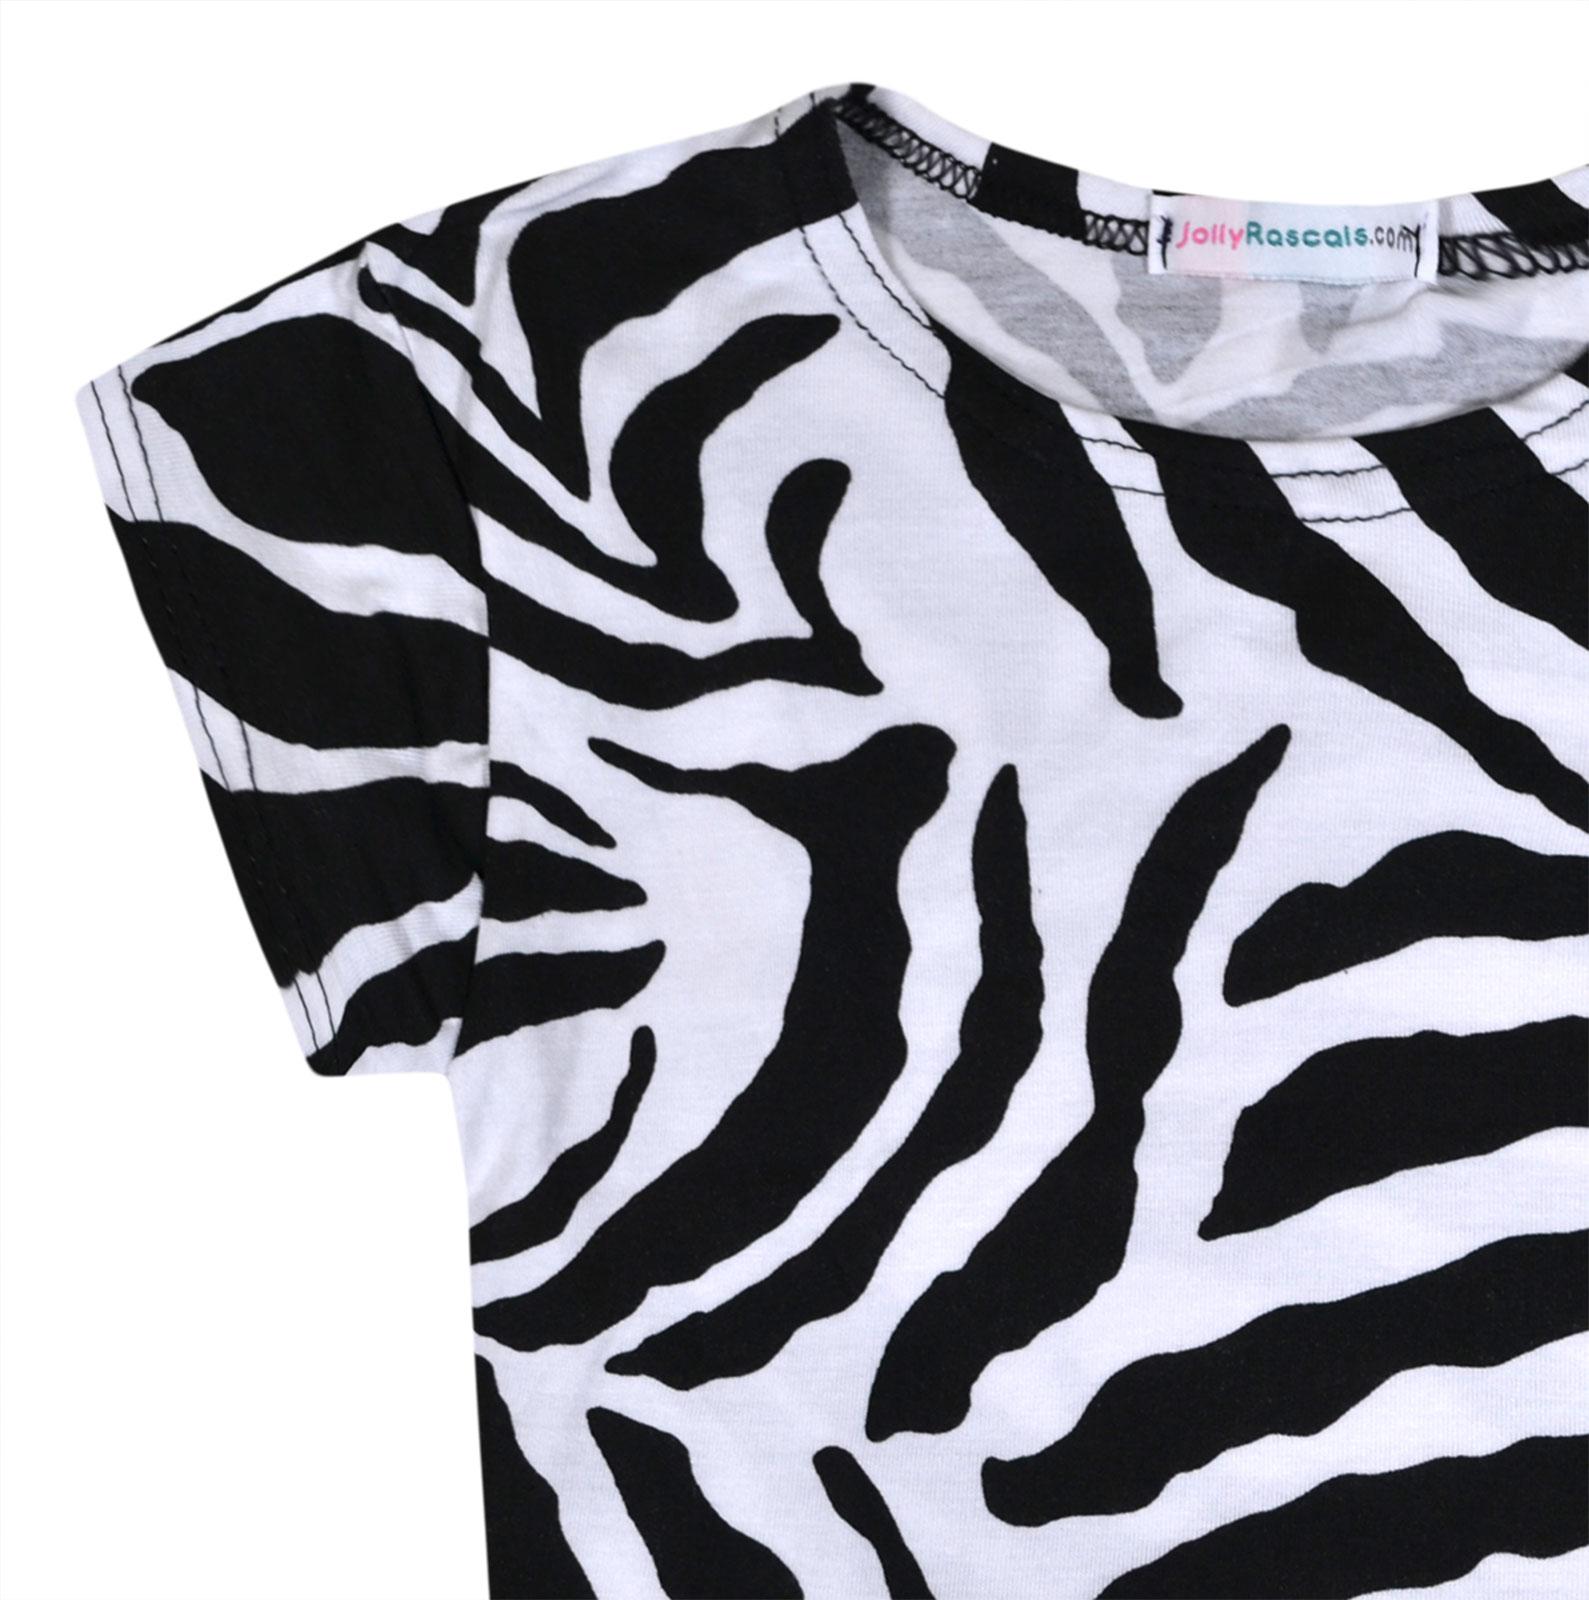 JollyRascals Girls Crop Top Short Sleeve T-Shirt Summer Top Leopard Aztec Zebra Print Kids New Tee Top Age 5 6 7 8 9 10 11 12 13 Years